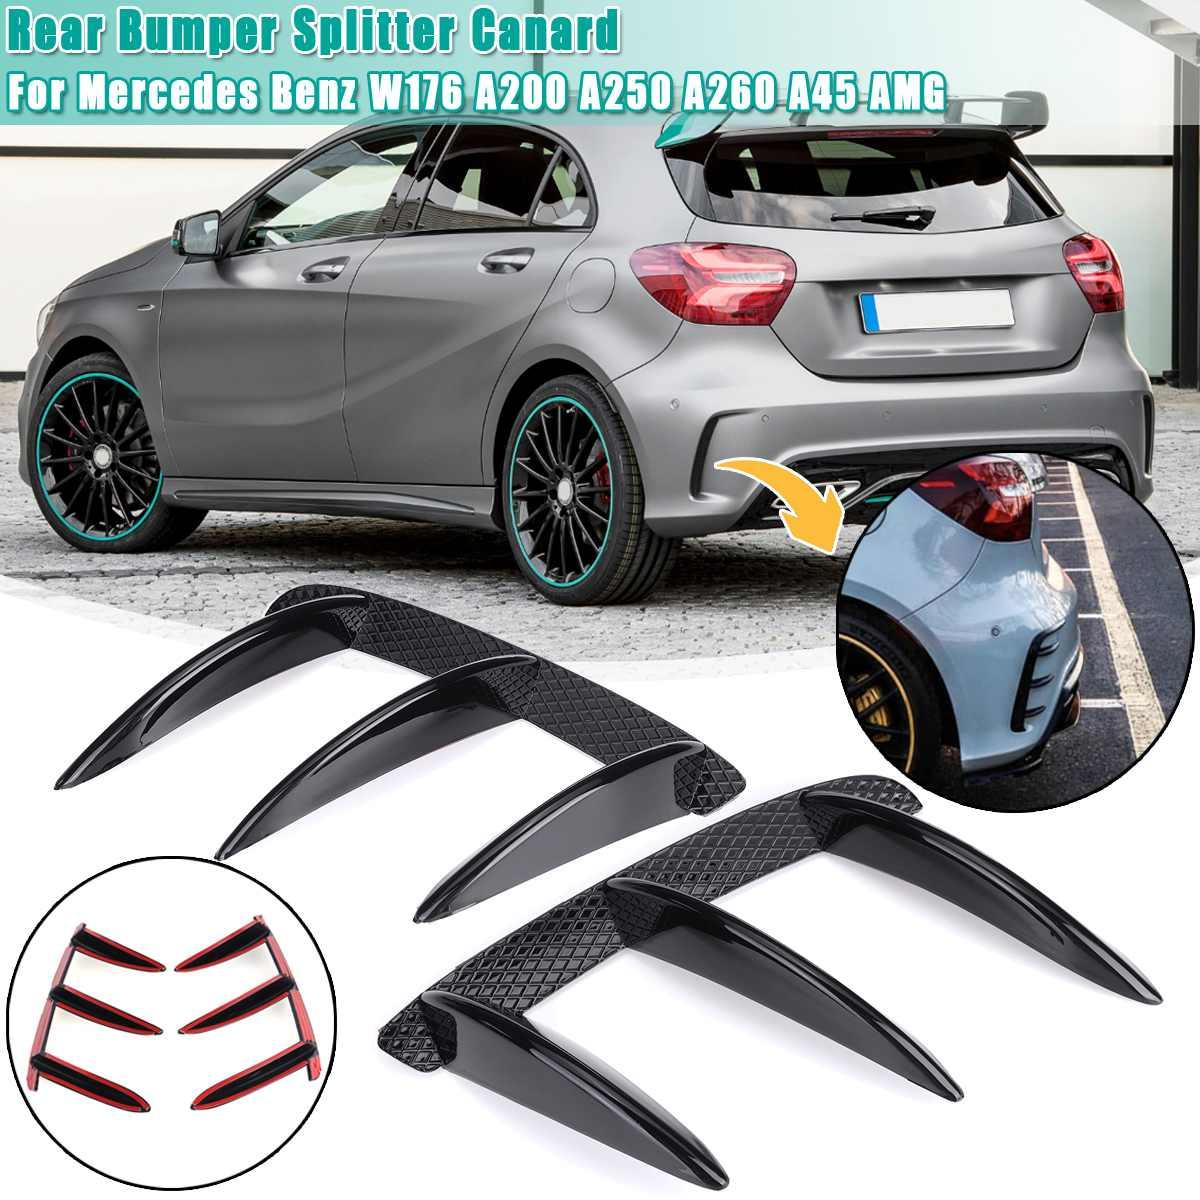 Coche ABS negro alerón para parachoques trasero Canards para Mercedes Benz para W176 A200 A250 A260 A45 para AMG 2 uds accesorios de repuesto